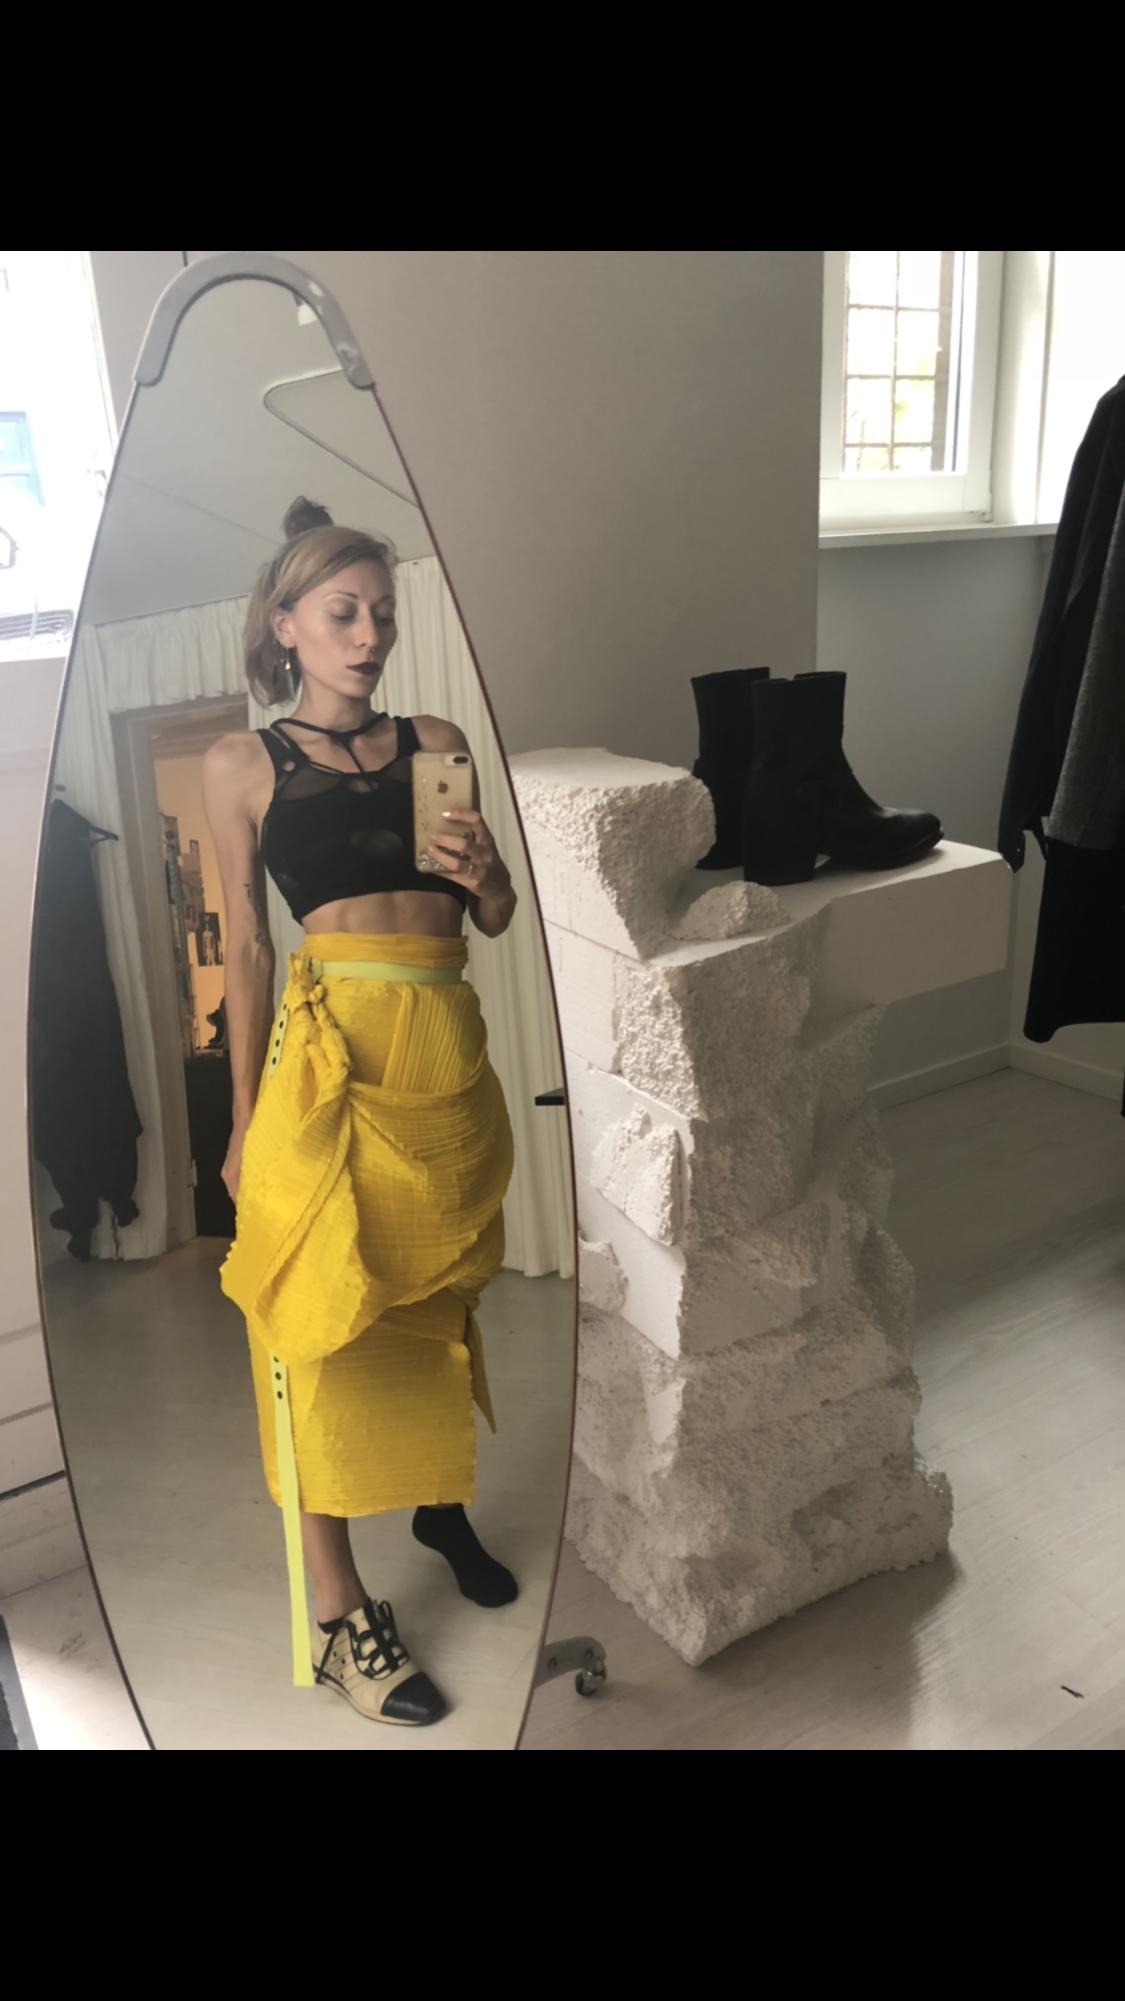 Cfw streetstyle/ Issey miyake, Vo/ft, Dior #valeriyaolkhova #voft #voft_knit #bustier #shapewear #sportfeel #black #knitted #lycra #smarttextiles #streetstyle #slowdesign #slowfashion #sustanabledesign #unconventional #conceptual #madeincopenhagen